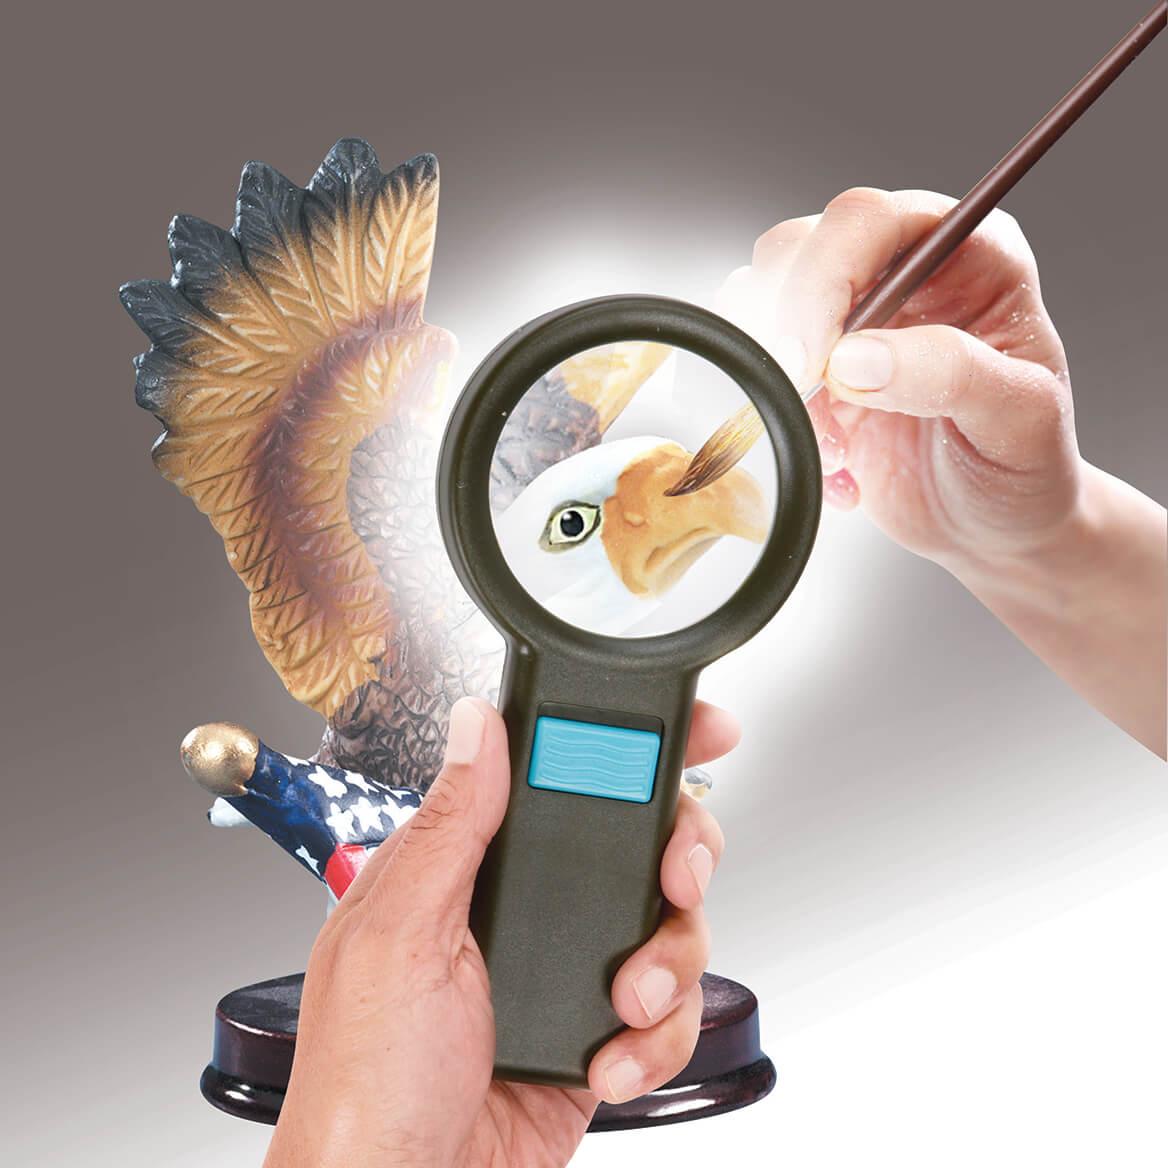 Illuminated Pocket Magnifier-369758